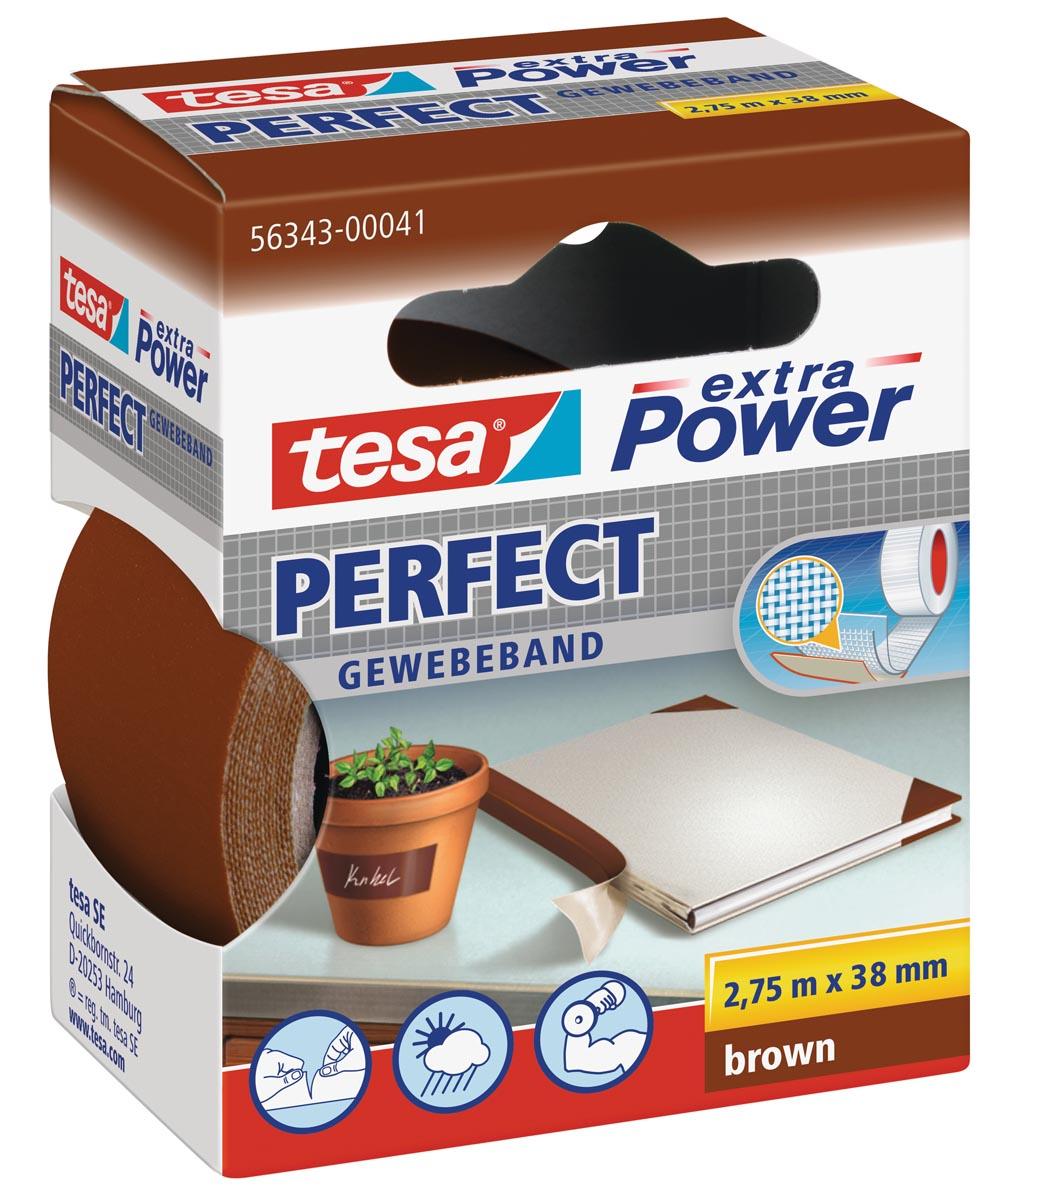 Tesa extra Power Perfect, ft 38 mm x 2,75 m, bruin